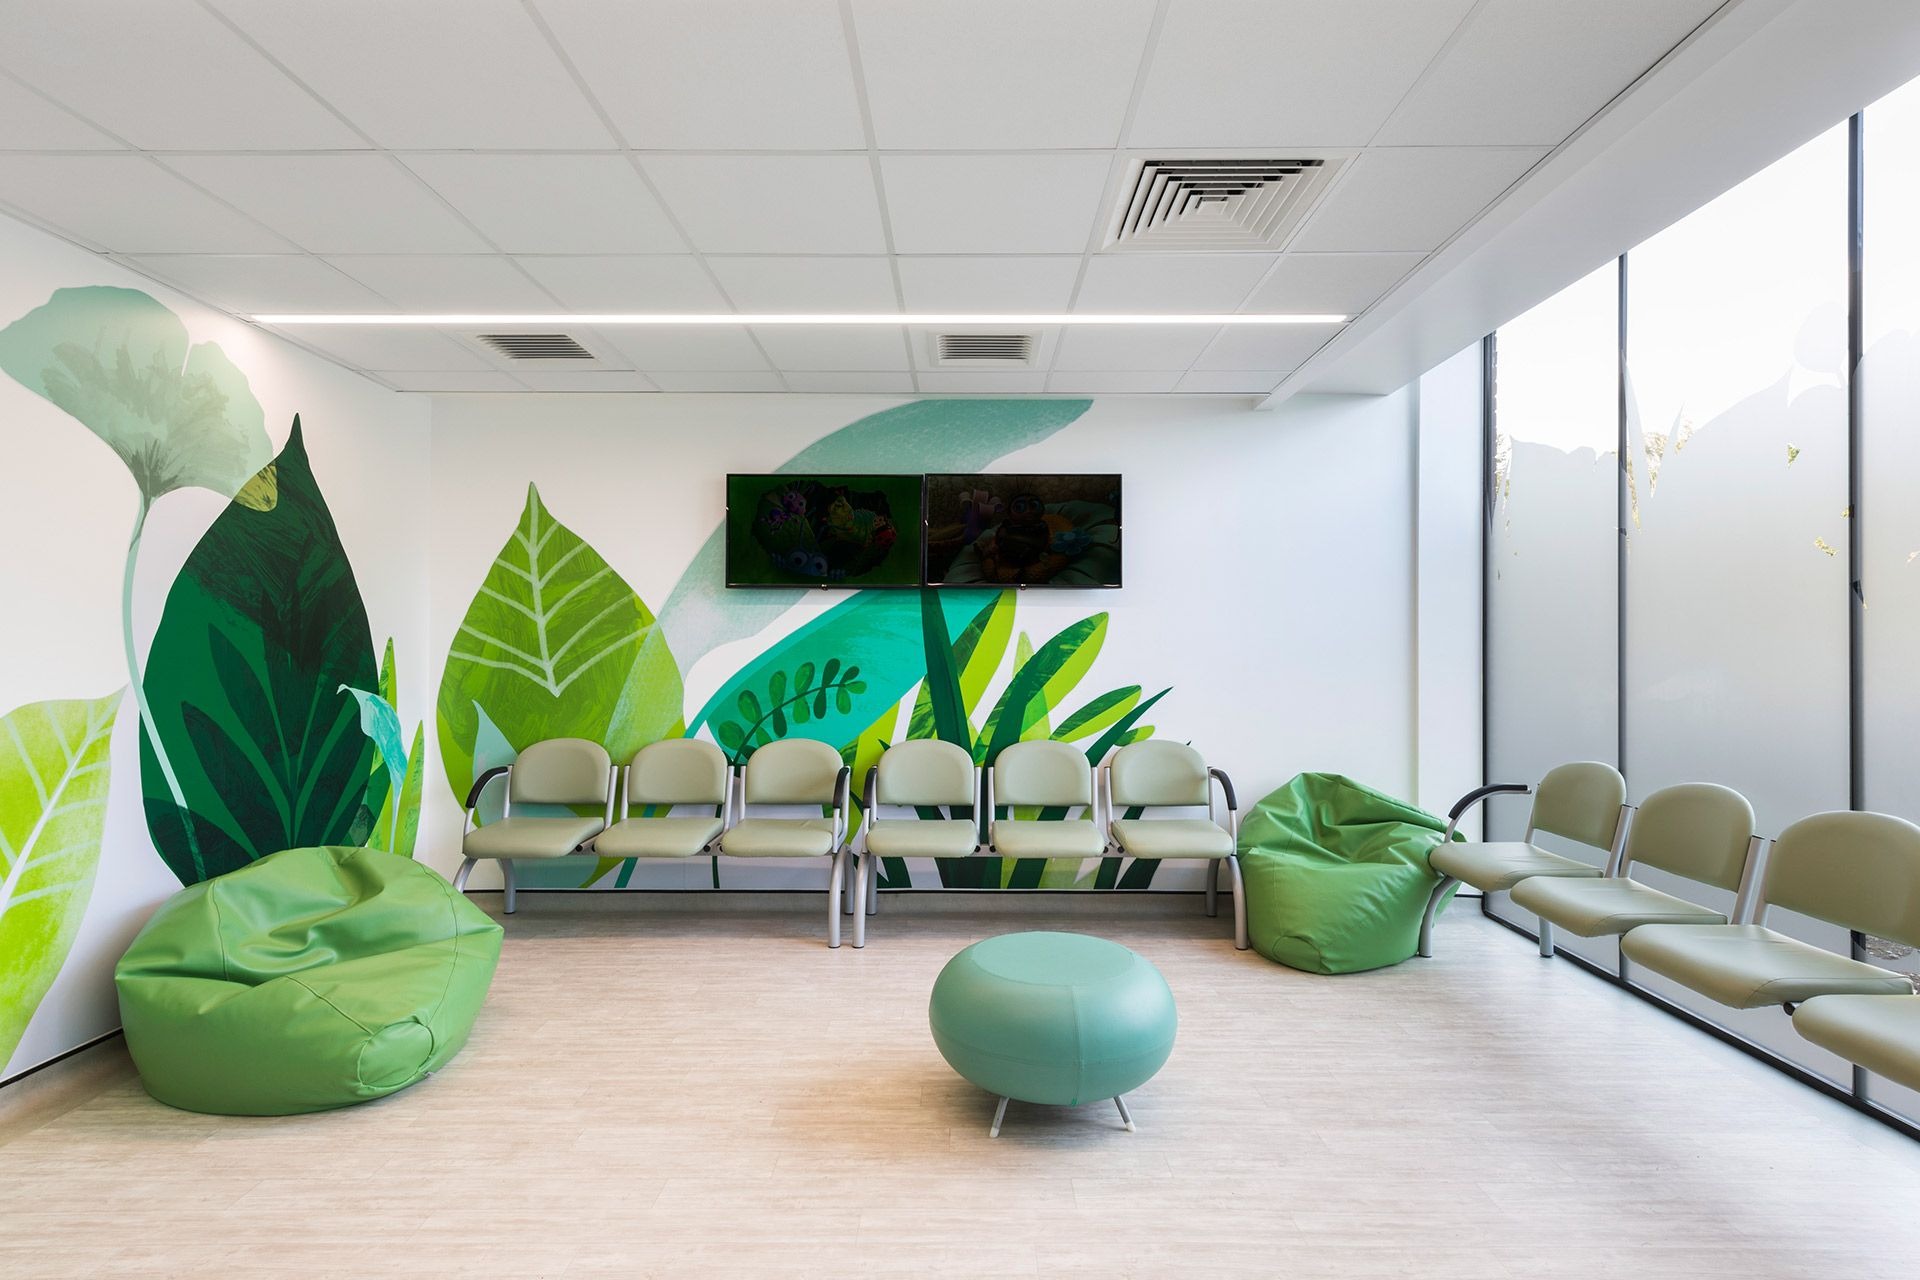 london hospital childrens waiting room interior Clinic